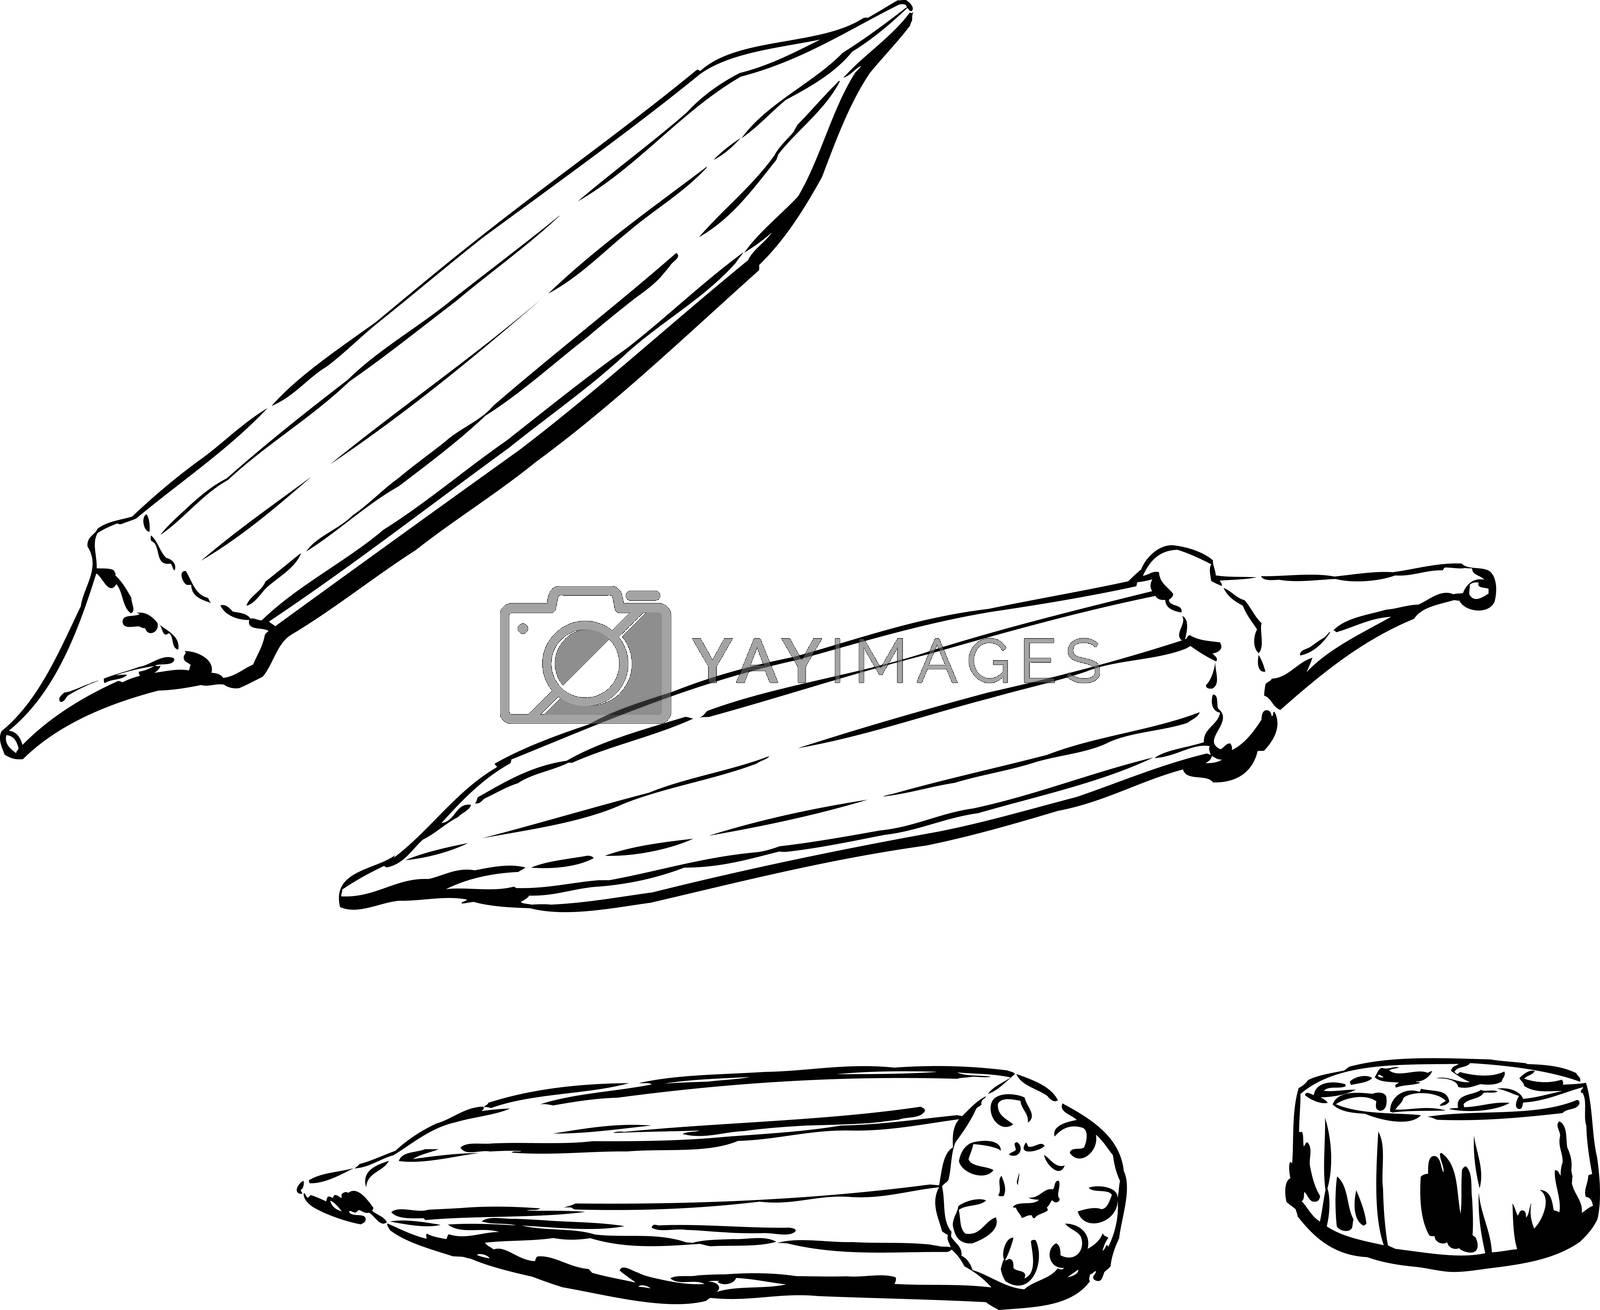 Outlined illustration of okra pod over white background